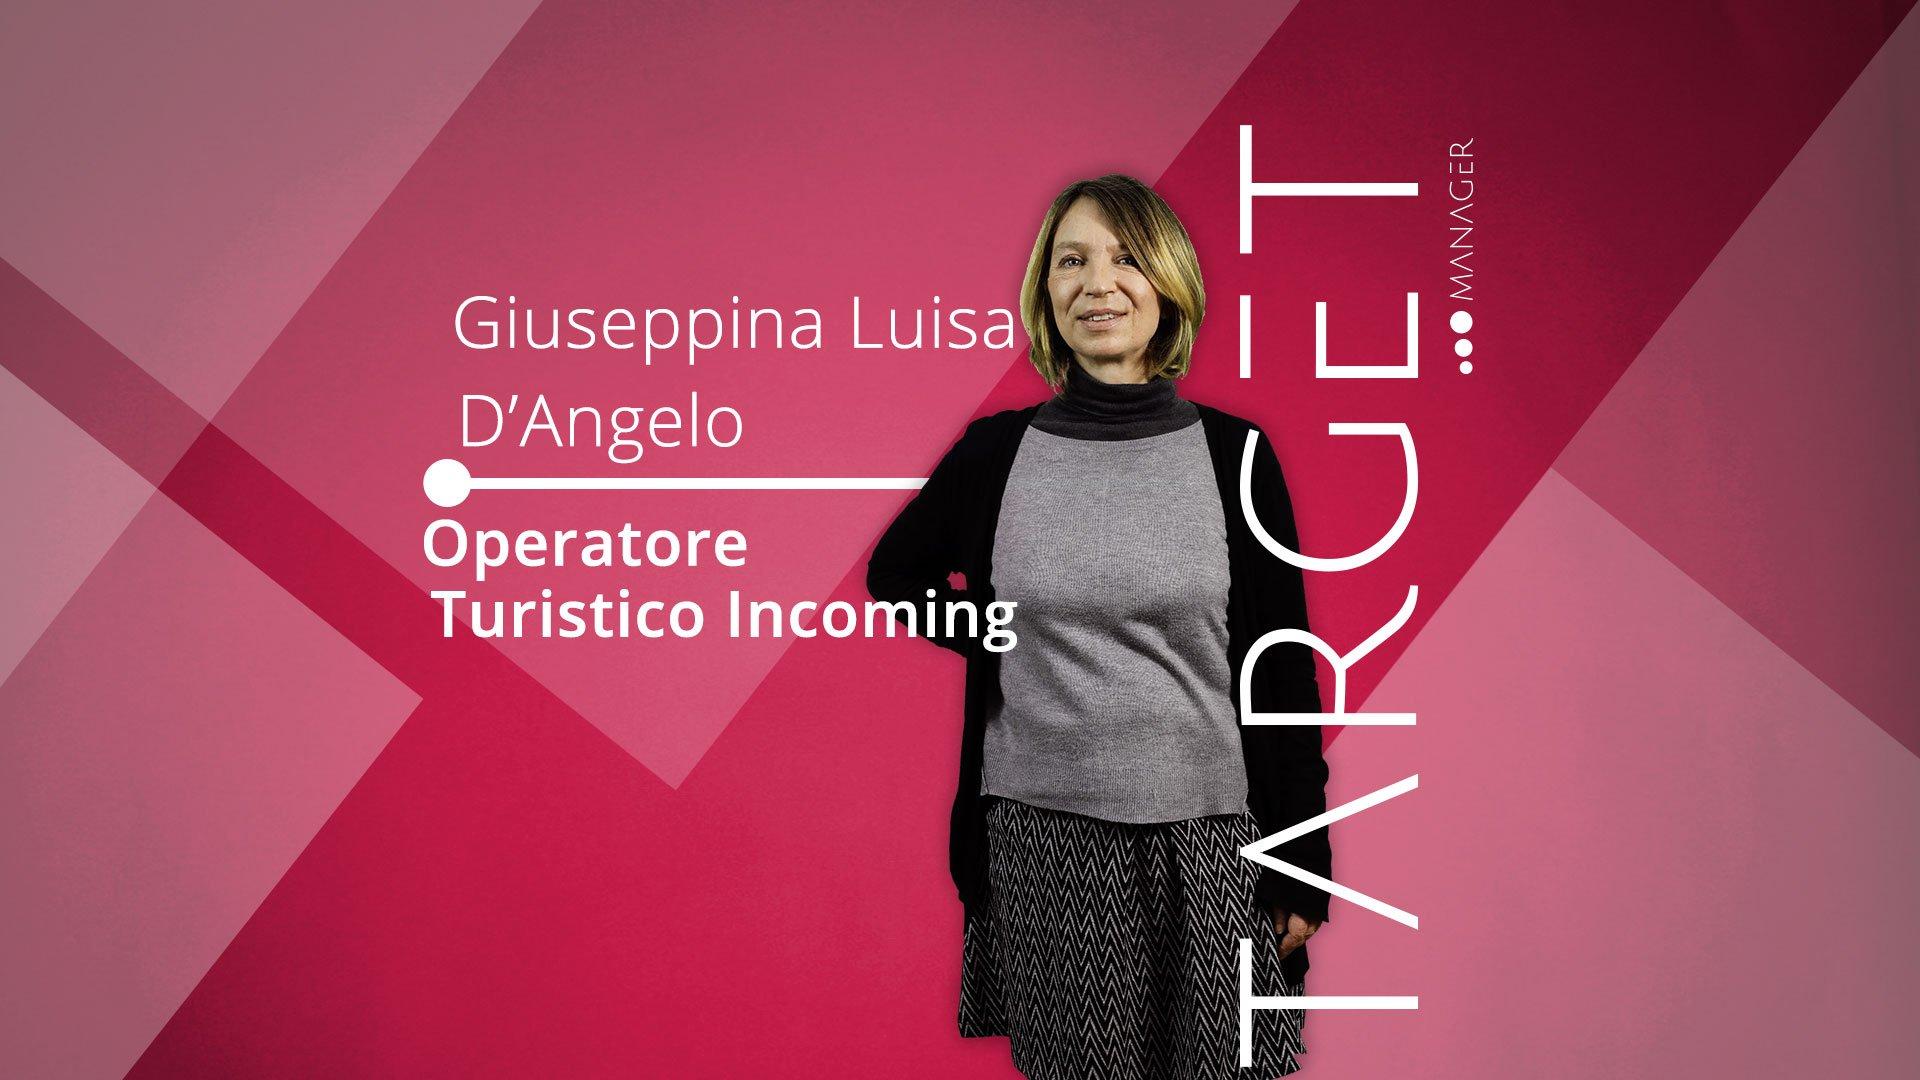 target giuseppina Luisa d'angelo